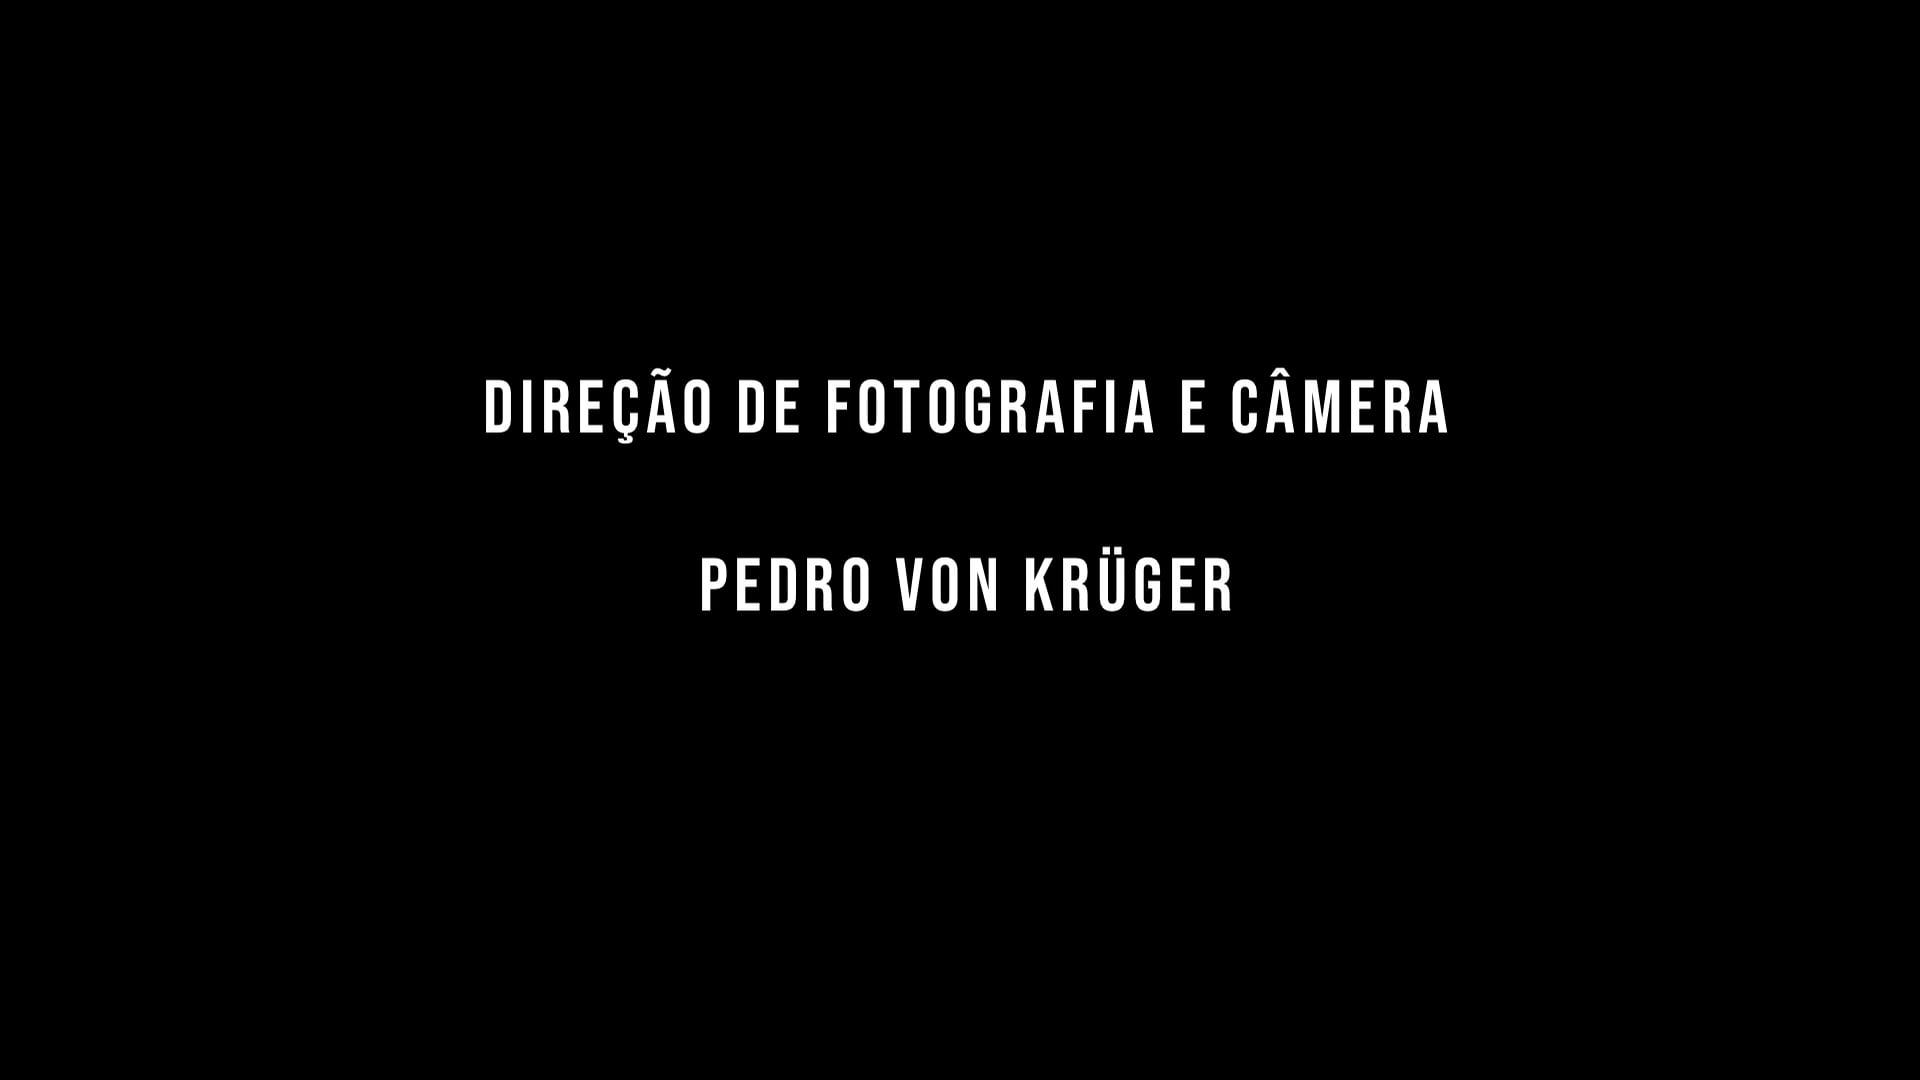 Pedro von Krüger   Fotografia